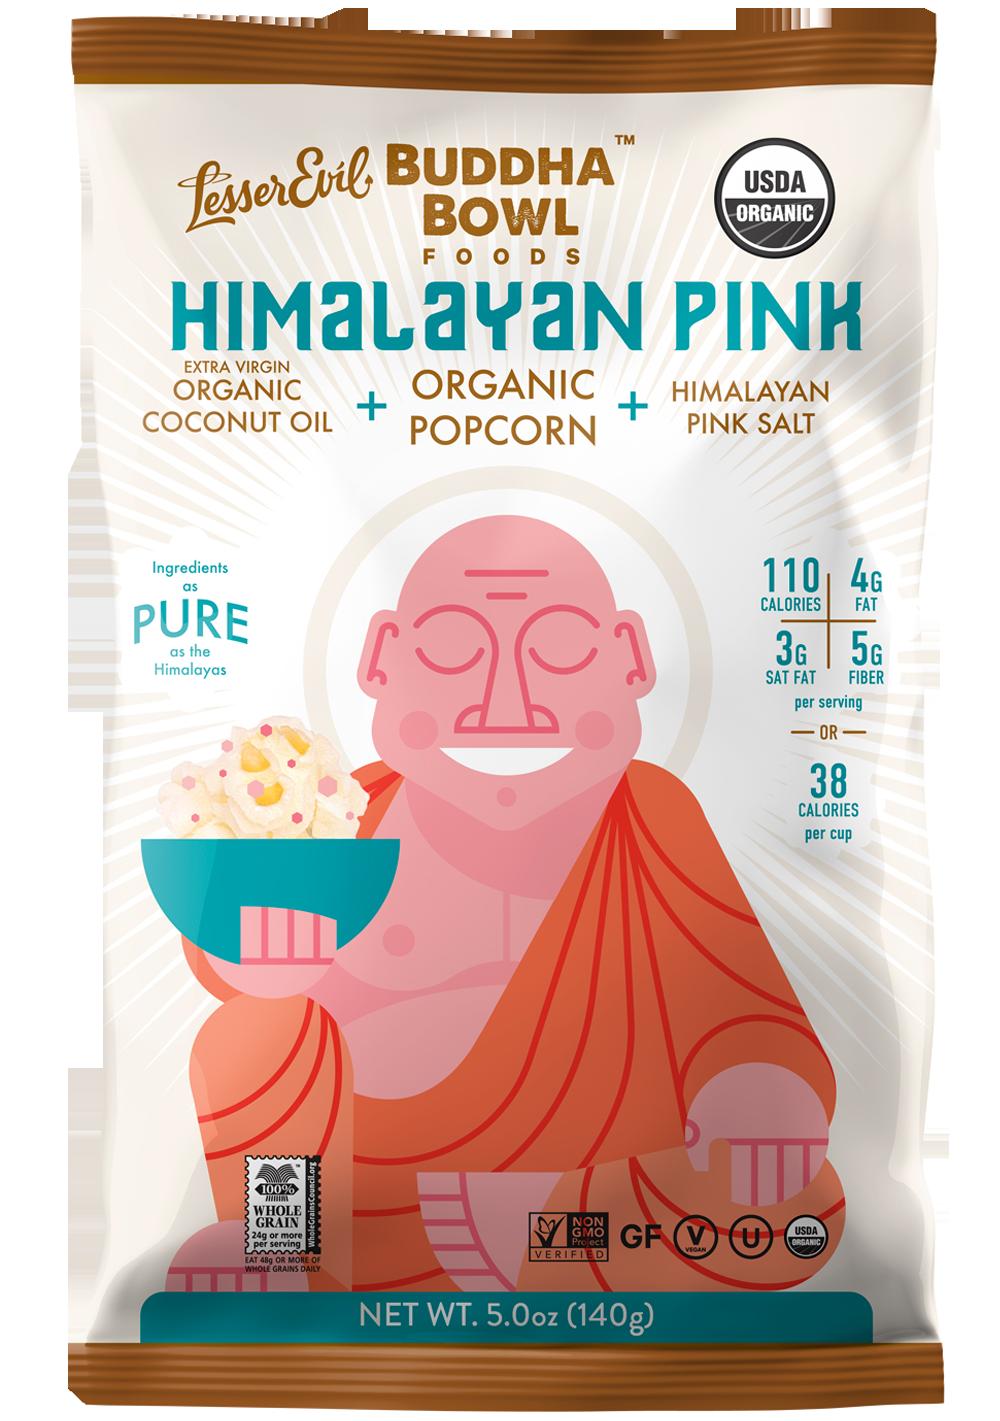 Lesser_Evil_Himalayan_Pink_Buddha_Bowl_Organic_Popcorn5oz1.png